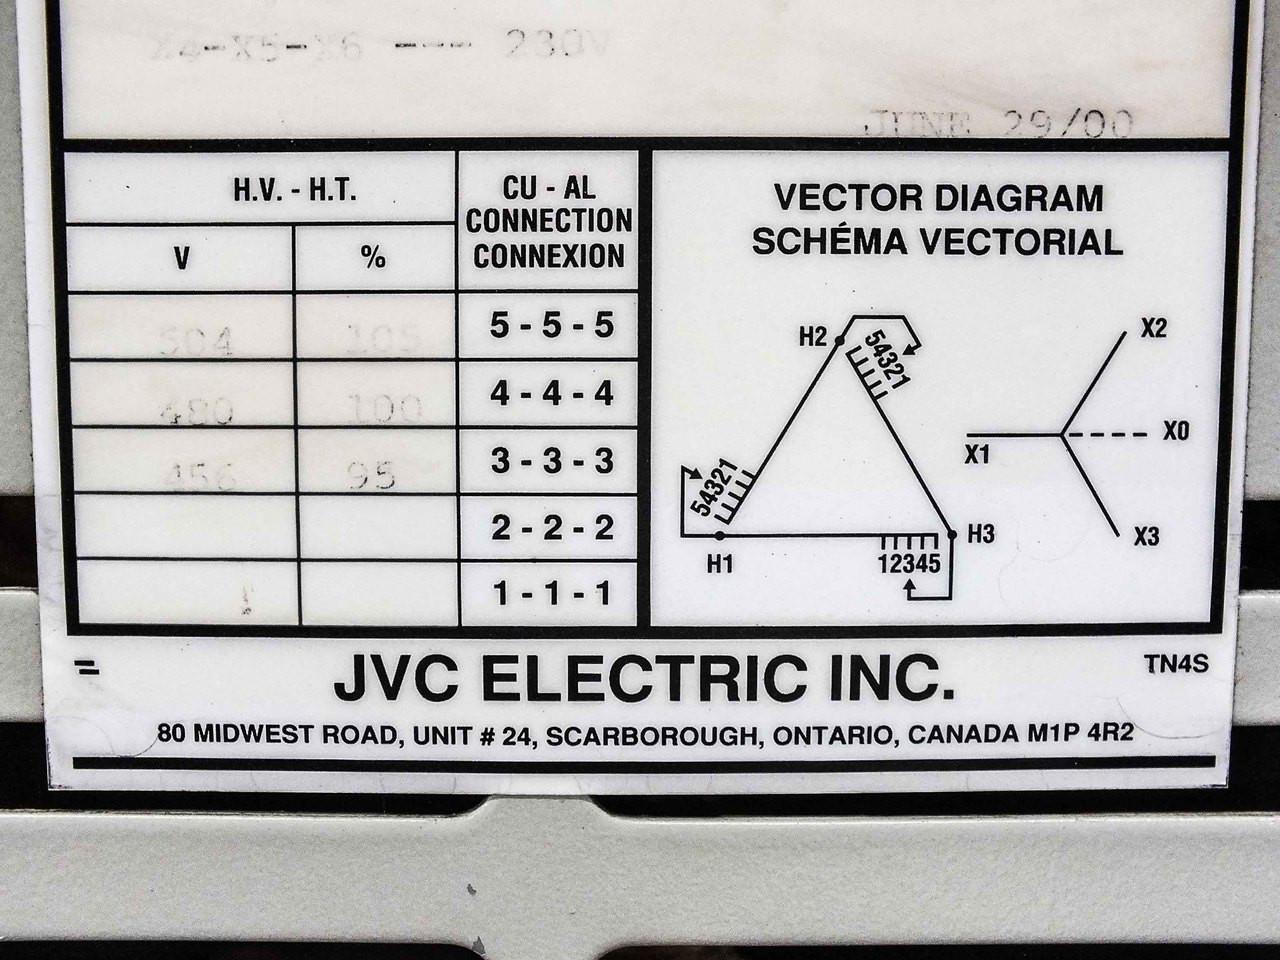 jvc electric dh3-15b-54c dry-type 15 kva general purpose transformer  480v